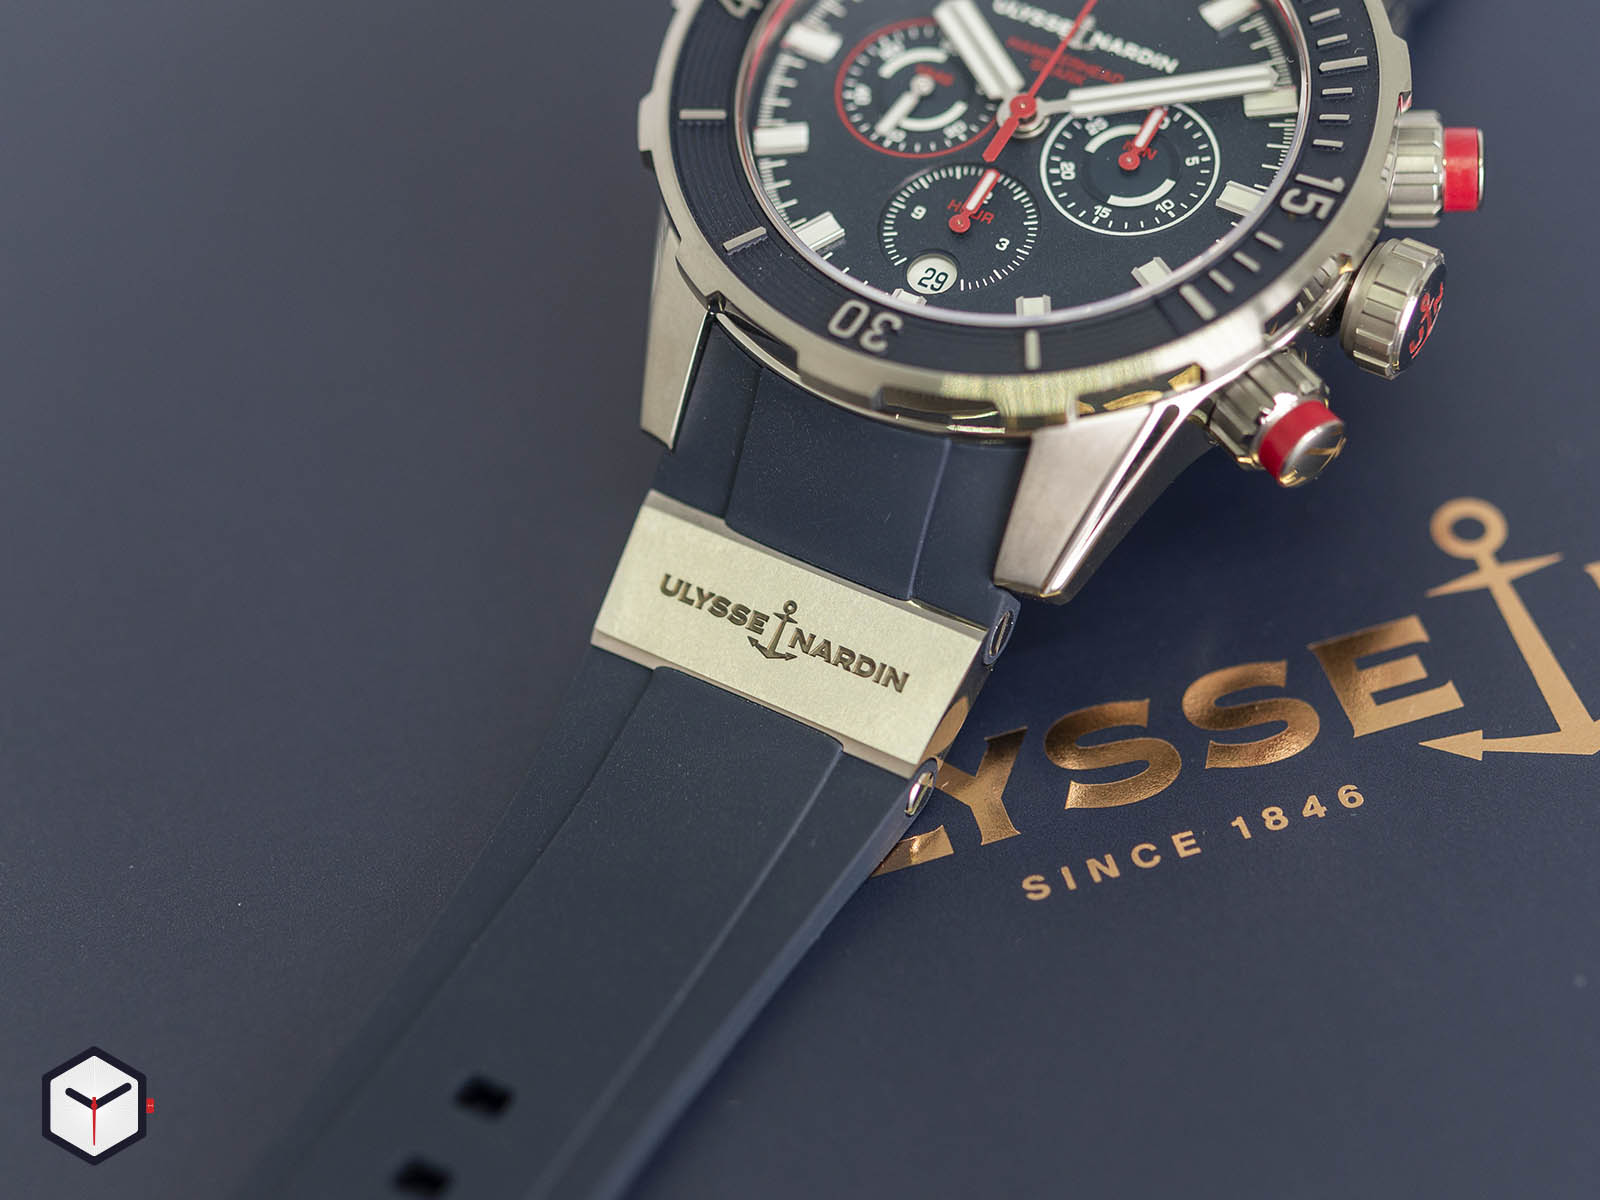 1503-170le-3-93-hammer-ulysse-nardin-diver-chronograph-44mm-hammerhead-shark-4.jpg